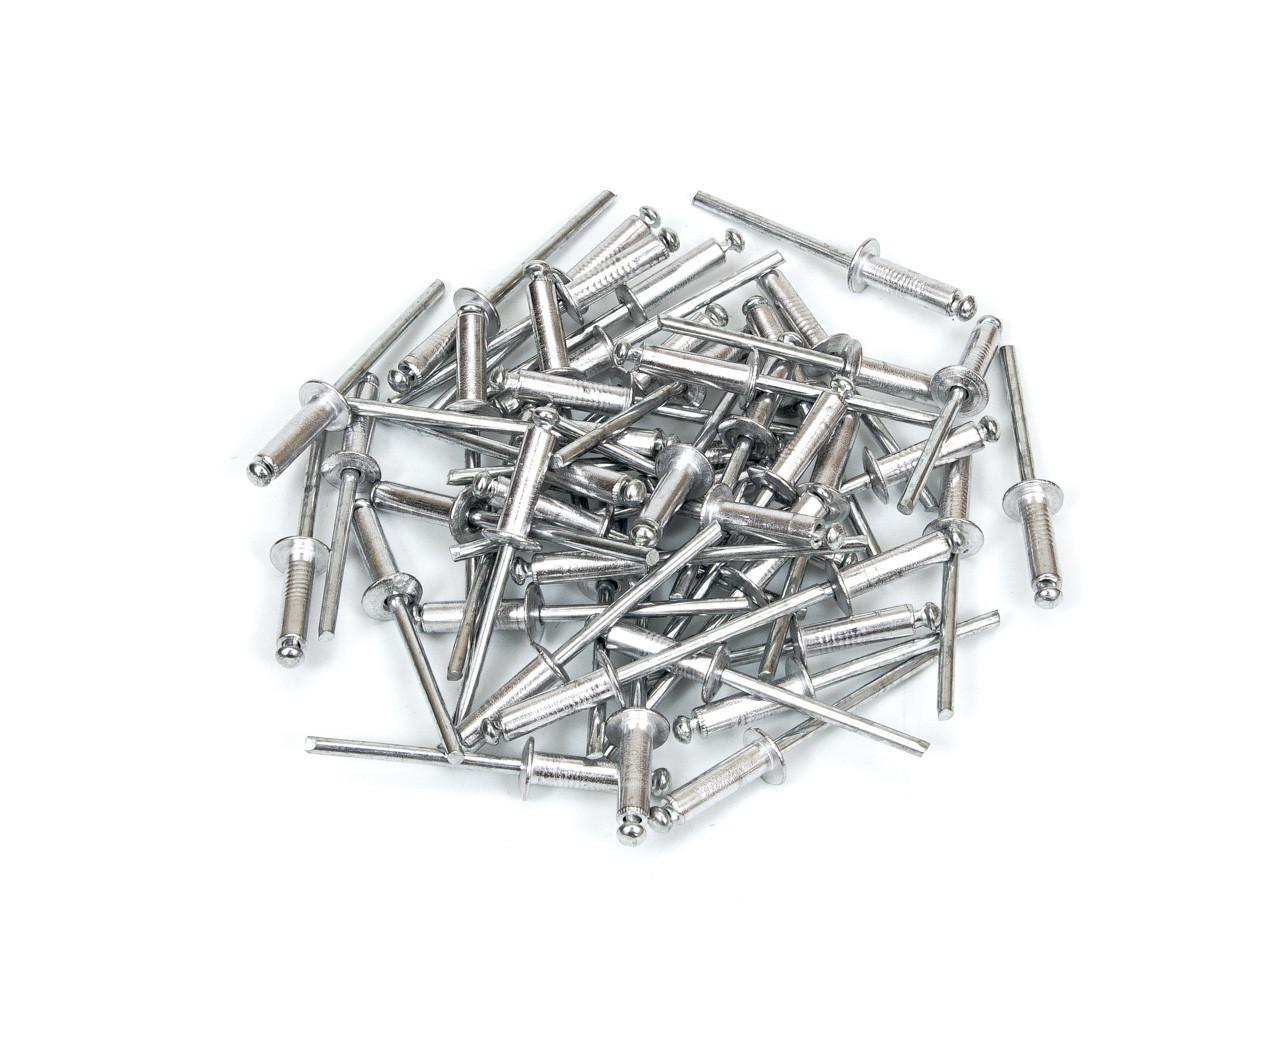 Алюмінієві заклепки 4,8 х 14 мм (50 шт.)